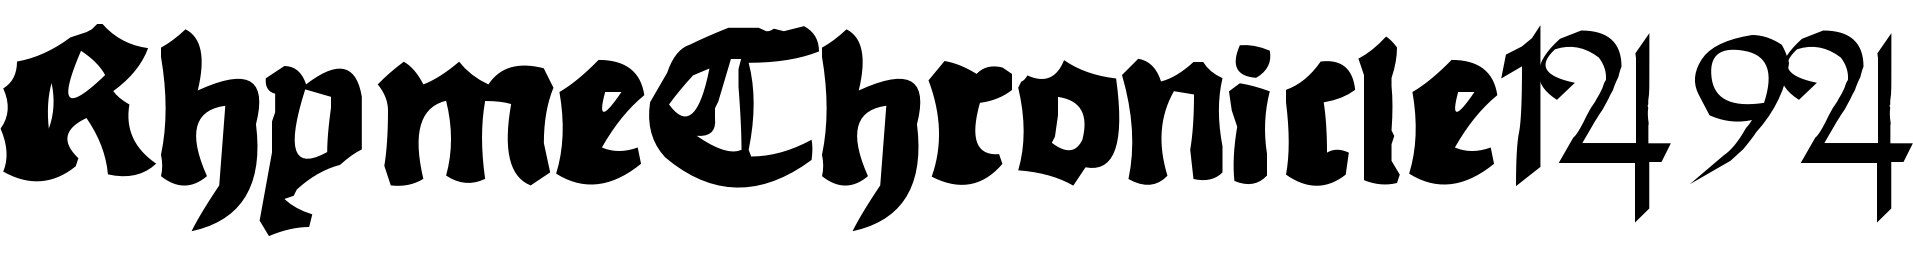 RhymeChronicle1494